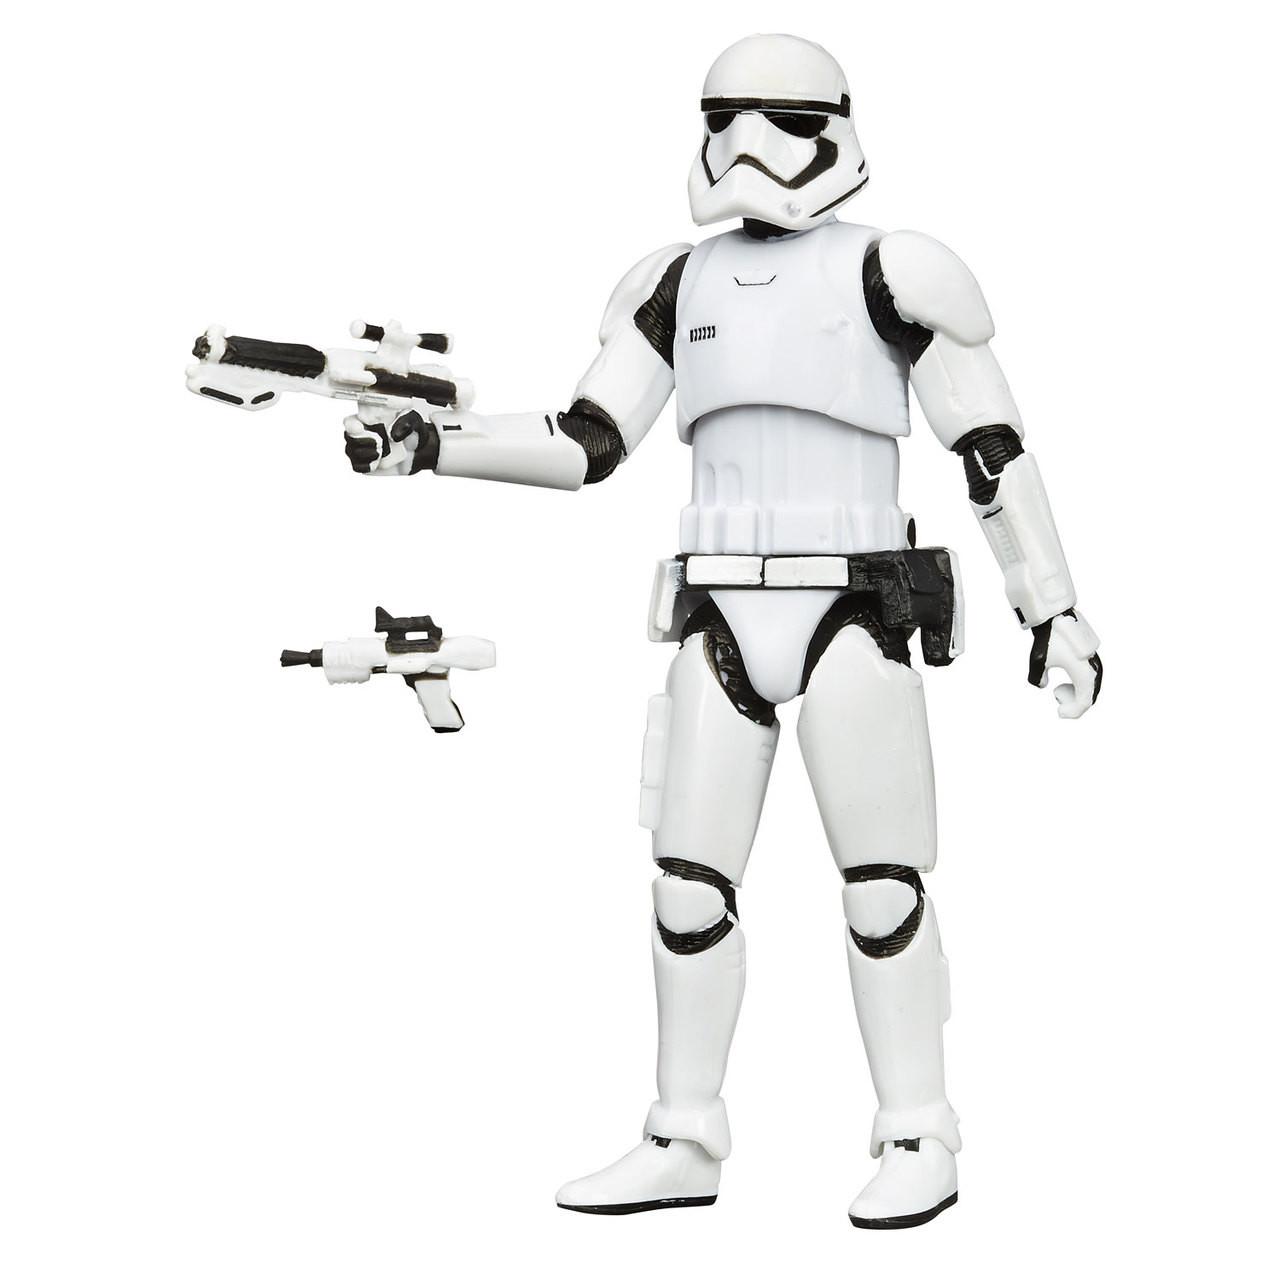 STAR WARS BLACK SERIES 3.75 First Order Stormtrooper